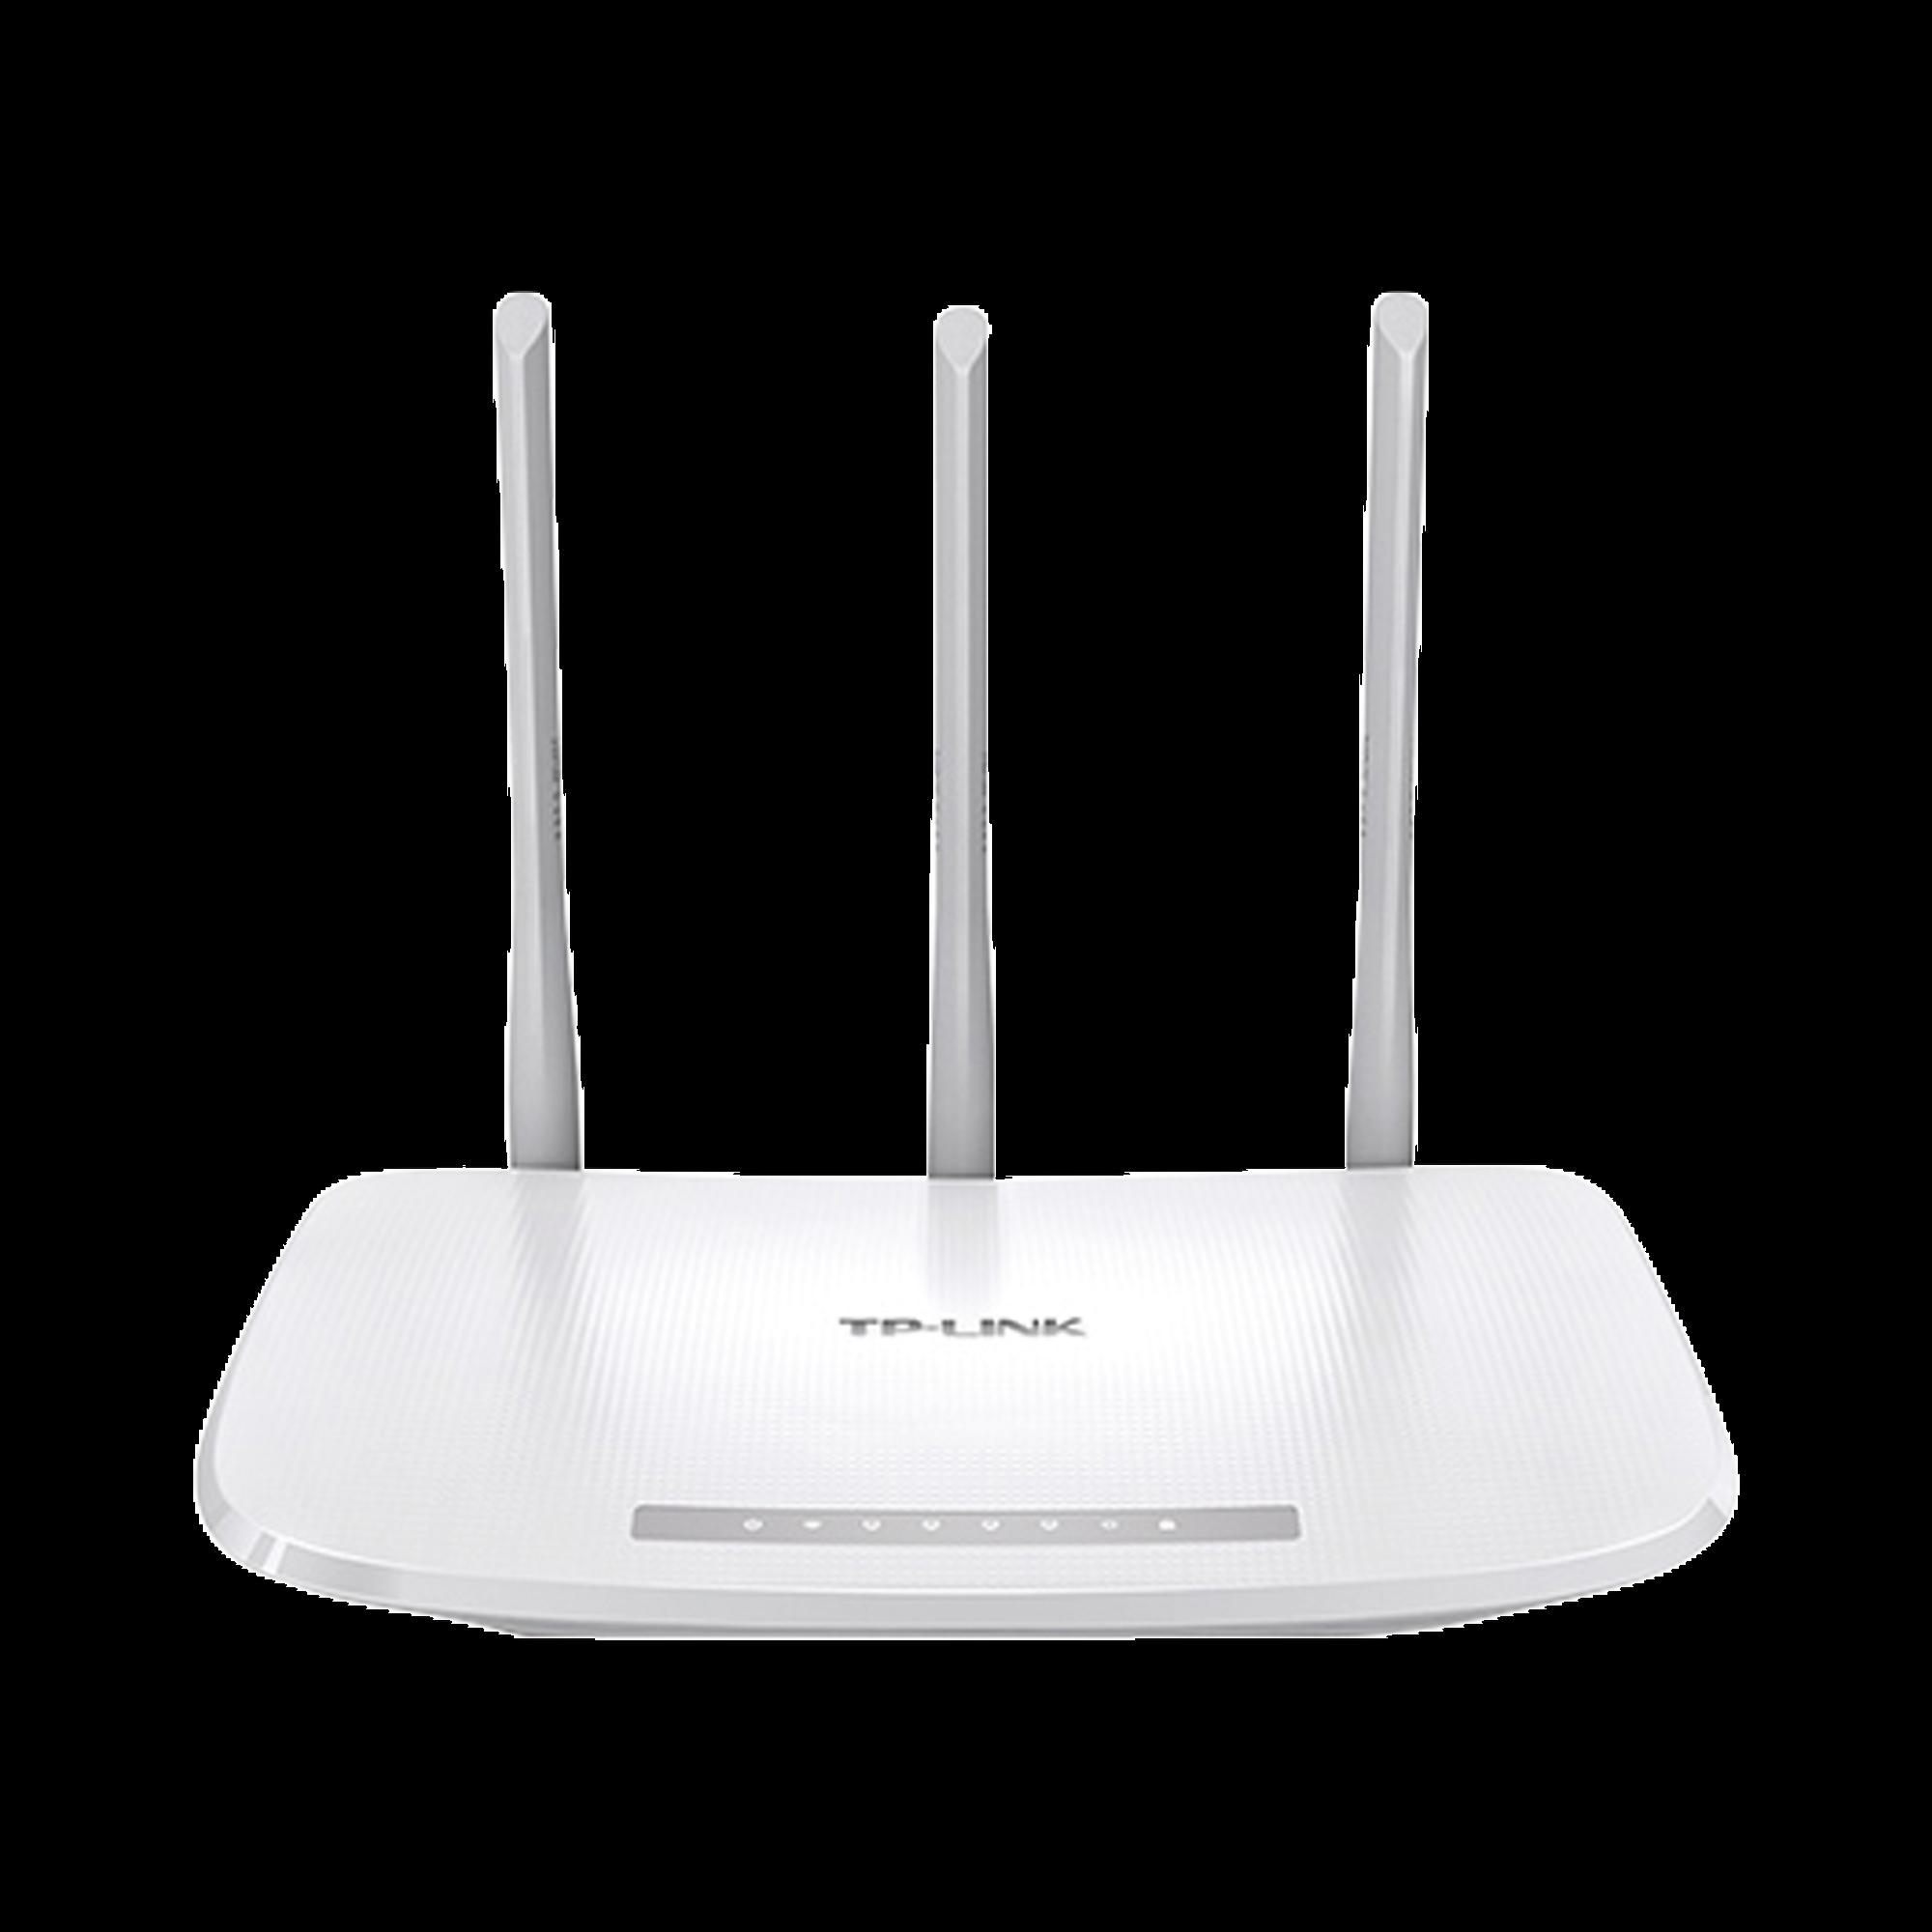 Router Inalámbrico WISP, 2.4 GHz, 300 Mbps, 3 antenas externas omnidireccional 5 dBi, 4 Puertos LAN 10/100 Mbps, 1 Puerto WAN 10/100 Mbps, IPTV, IPV6